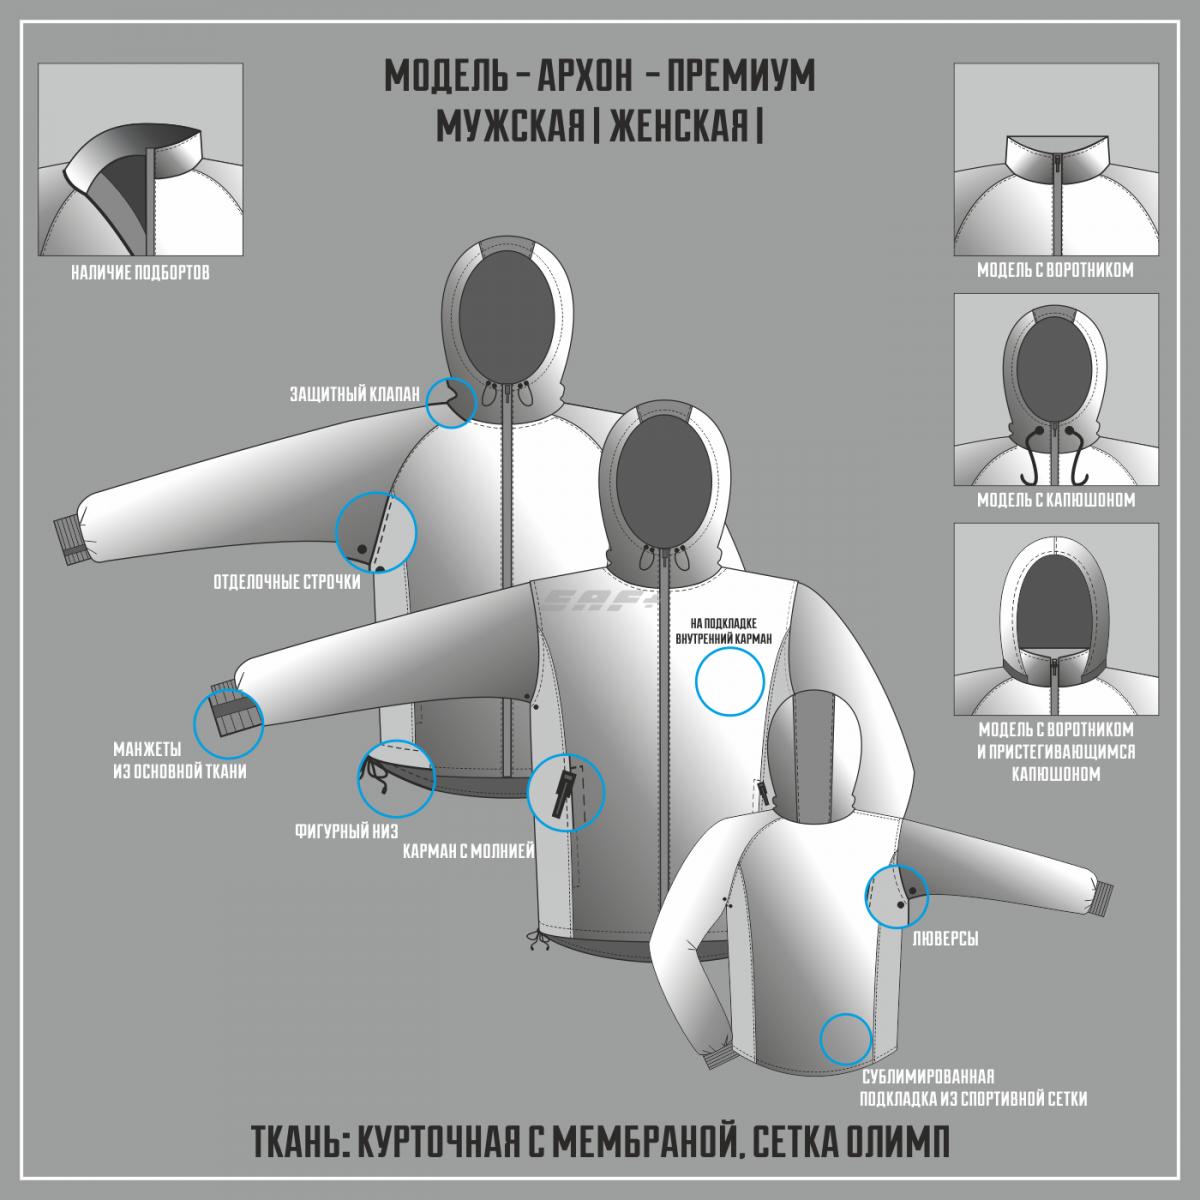 АРХОН-ПРЕМИУМ ветровка (Частичная сублимация)